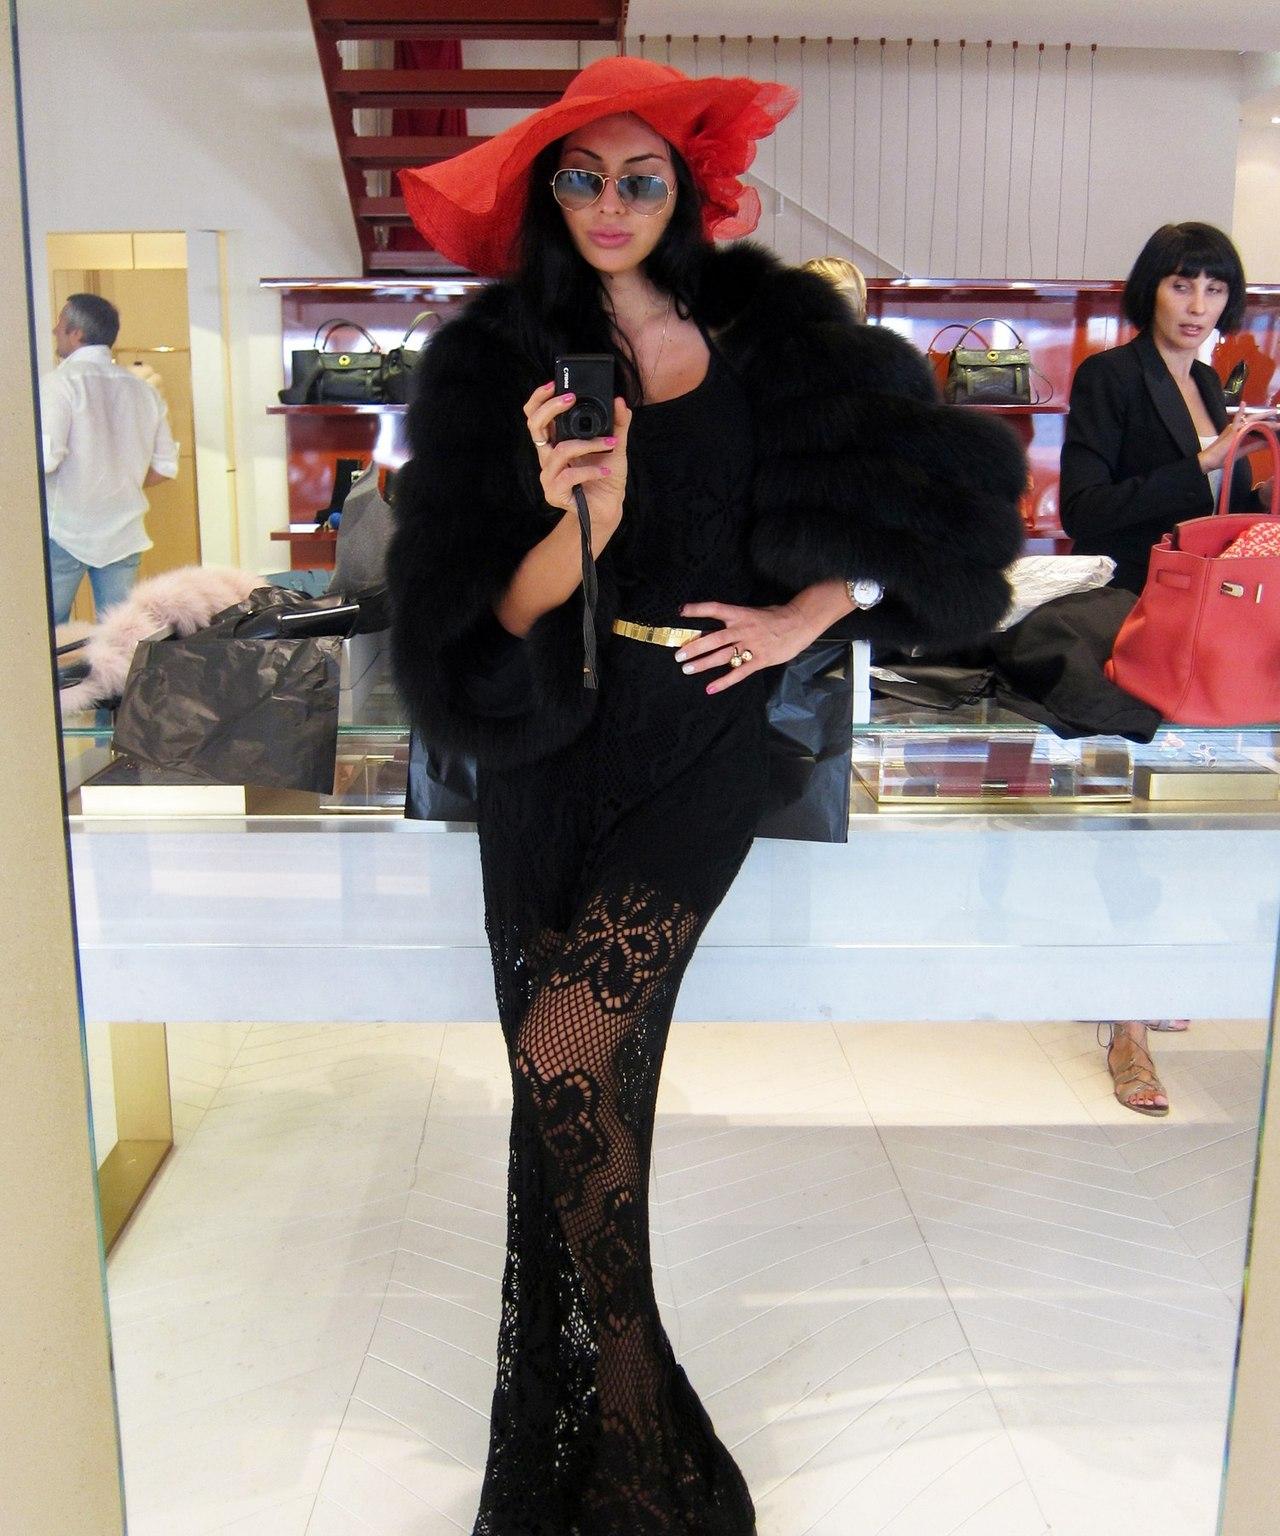 http://jetsetbabe.com/wp-content/uploads/2013/03/Olesya-Malinskaya11.jpg